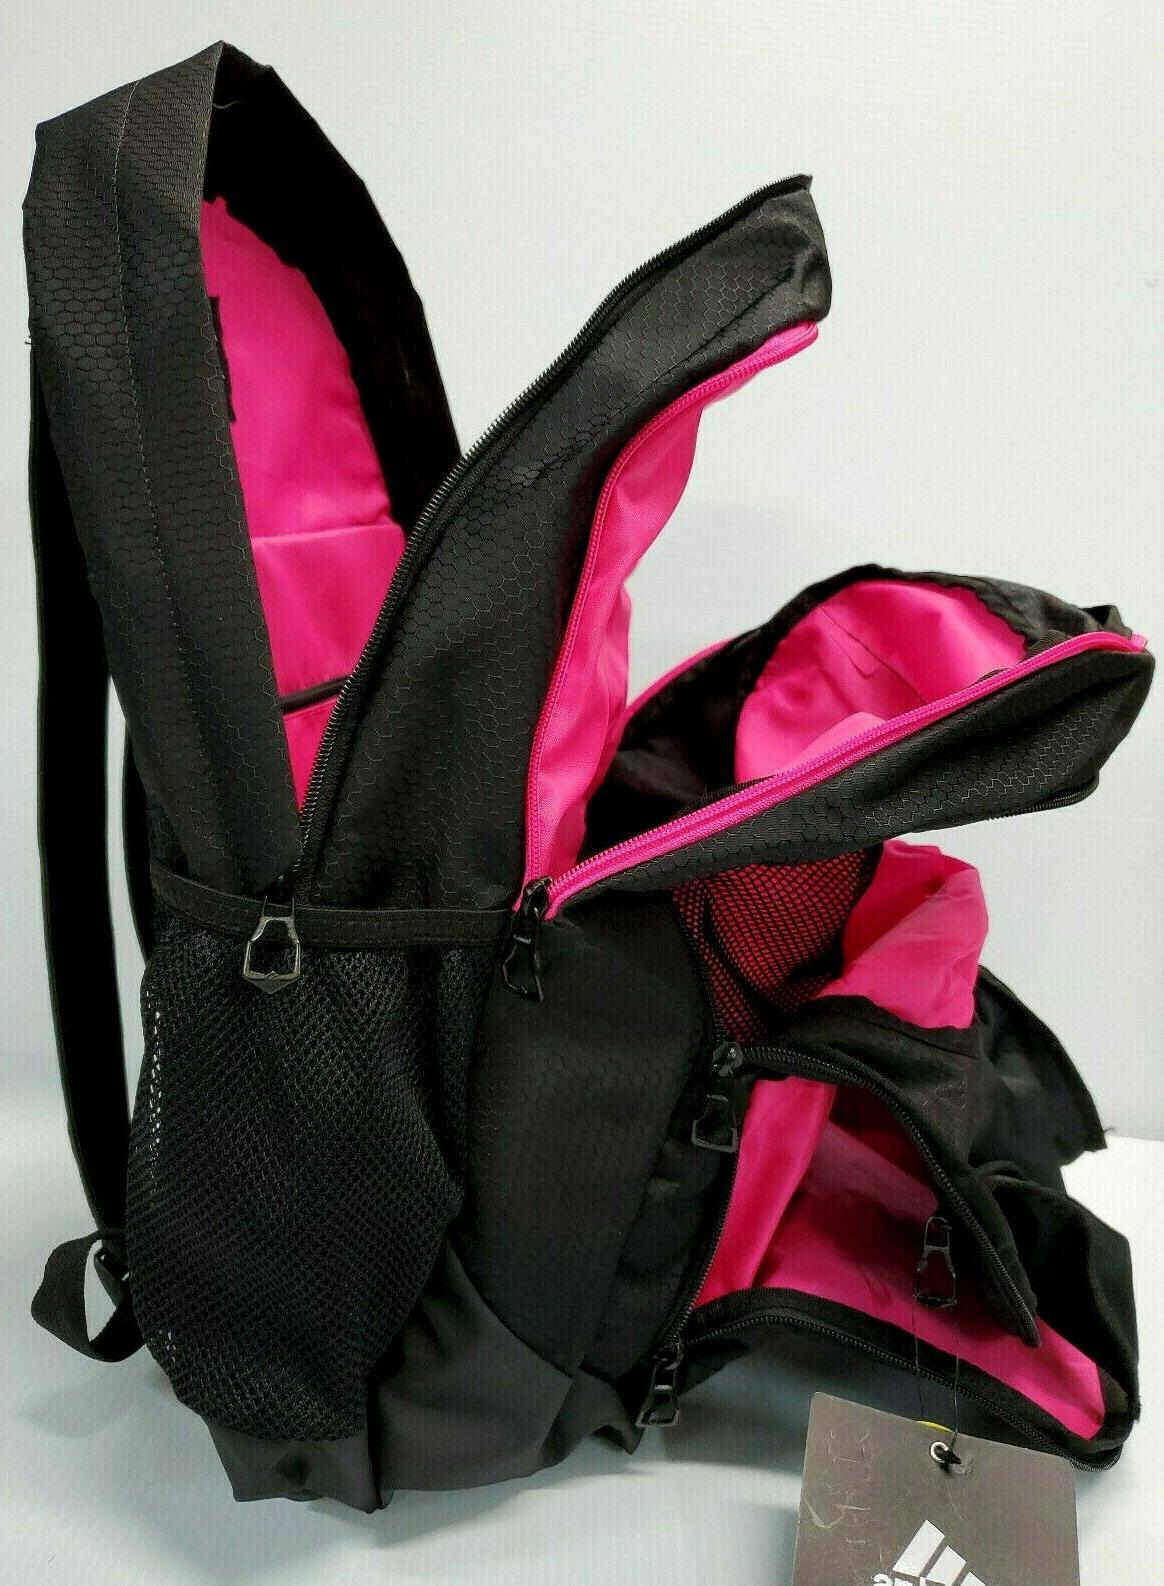 Adidas Prime 4 XL Backpack Color Black Pink